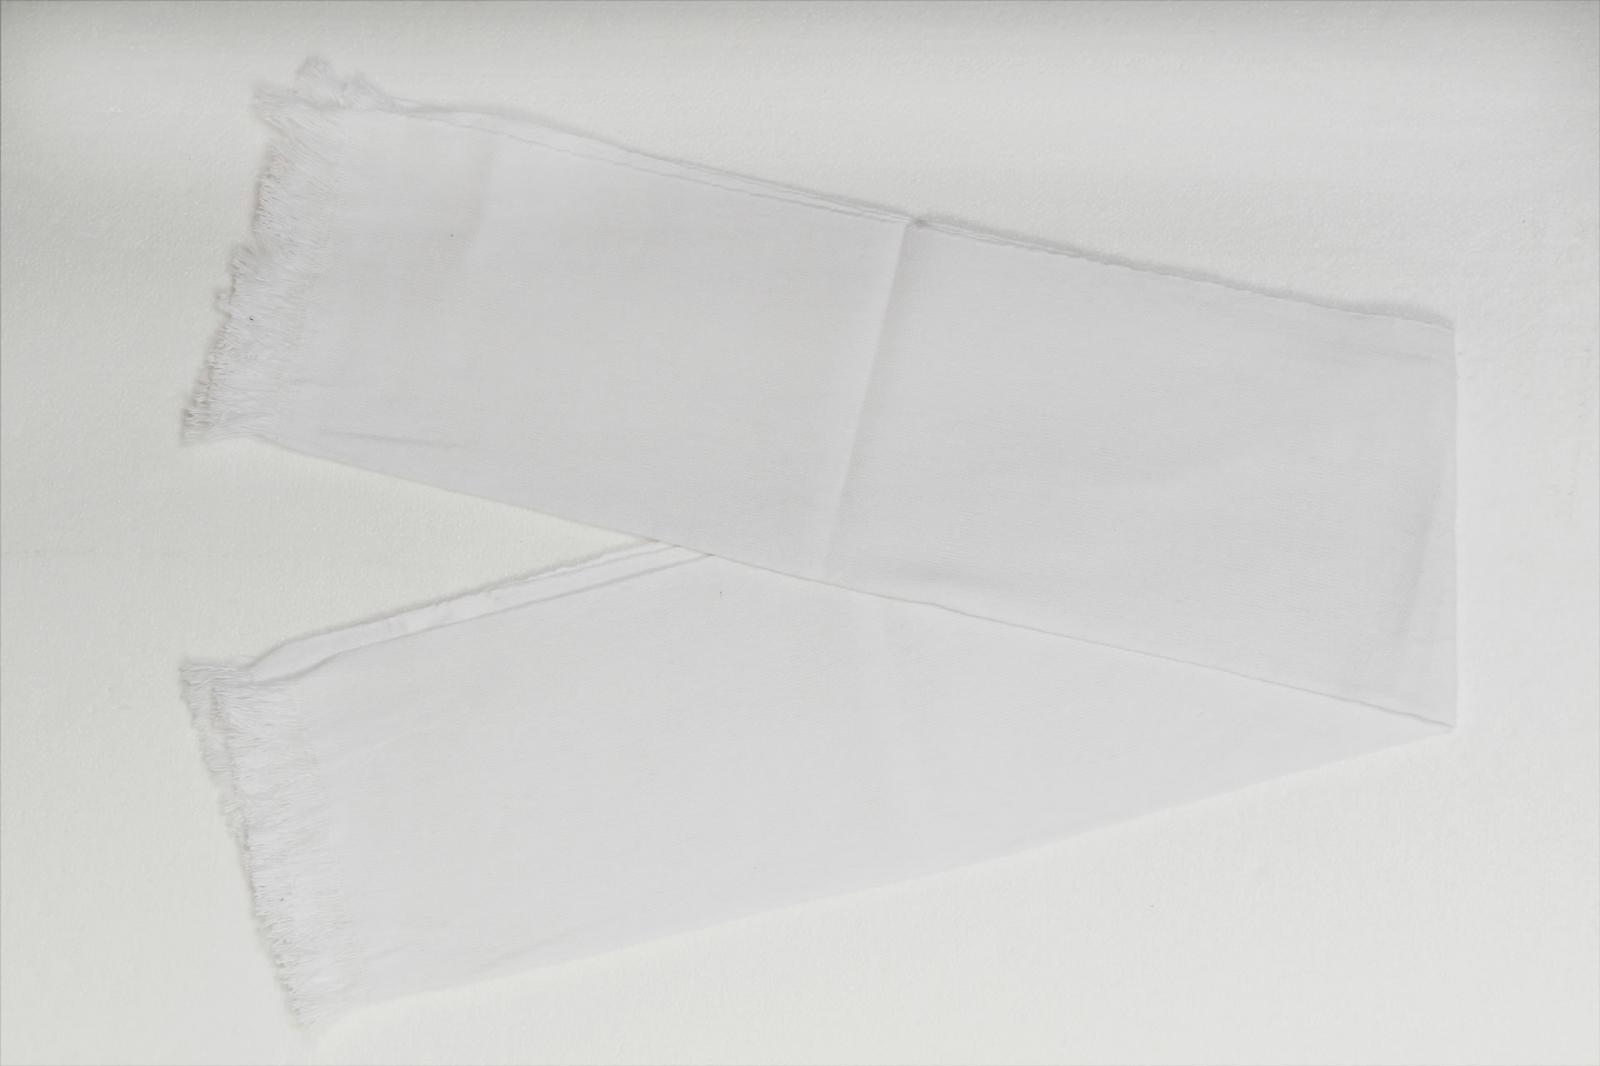 Mulera Sencilla Blanca